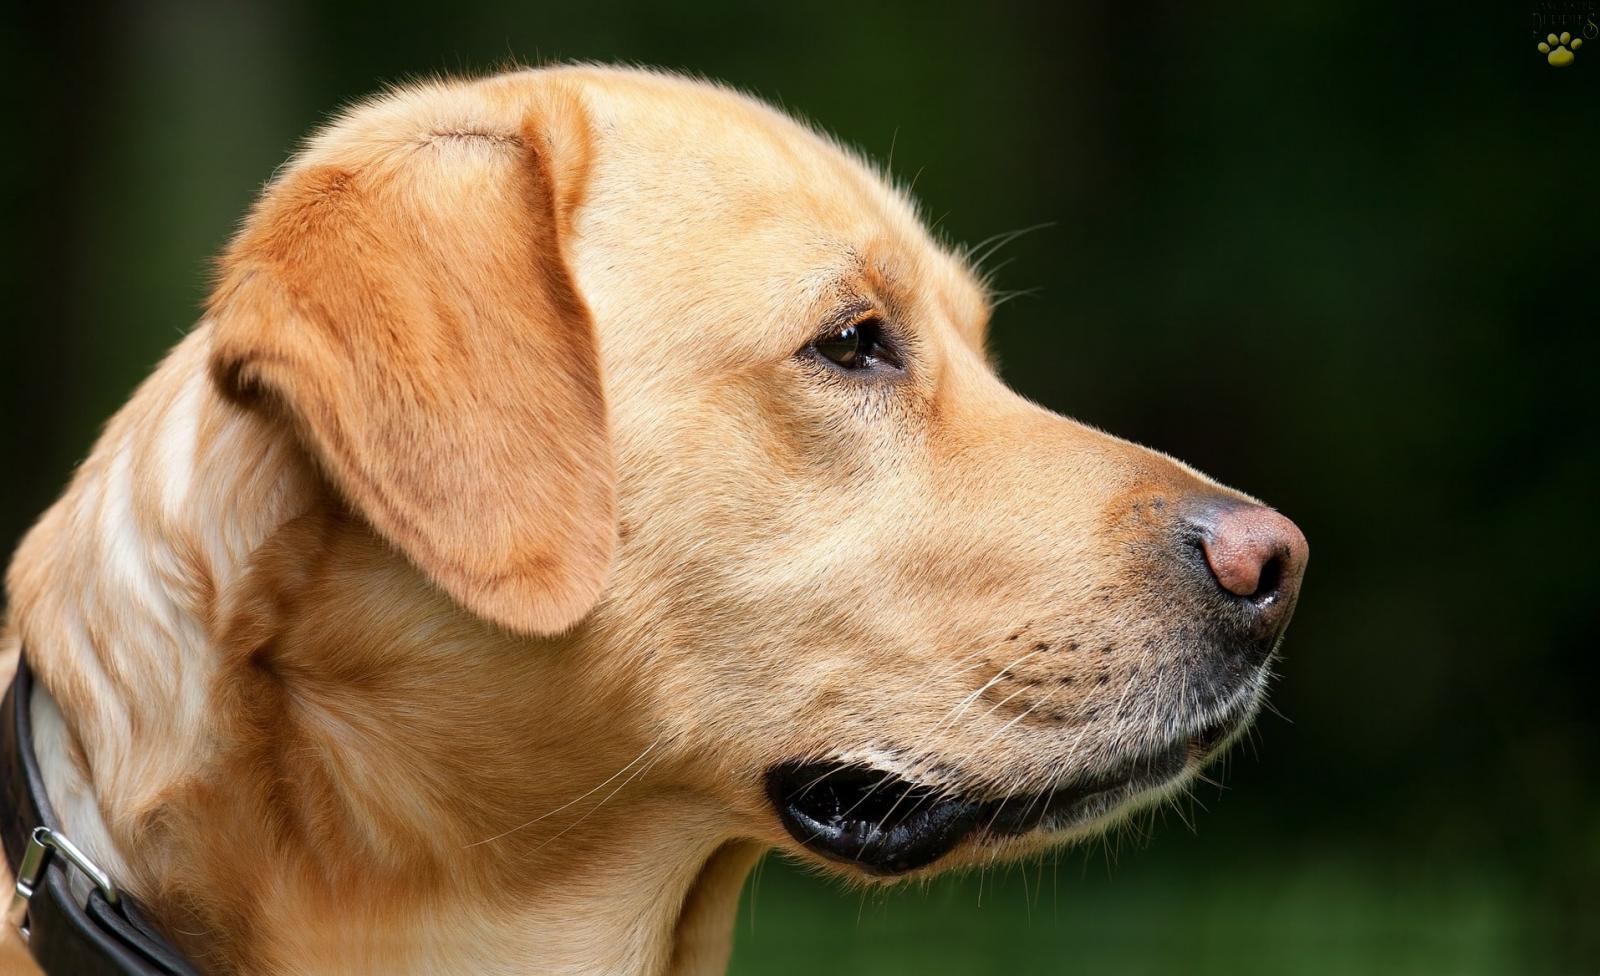 Profile of an adult yellow labrador retriever